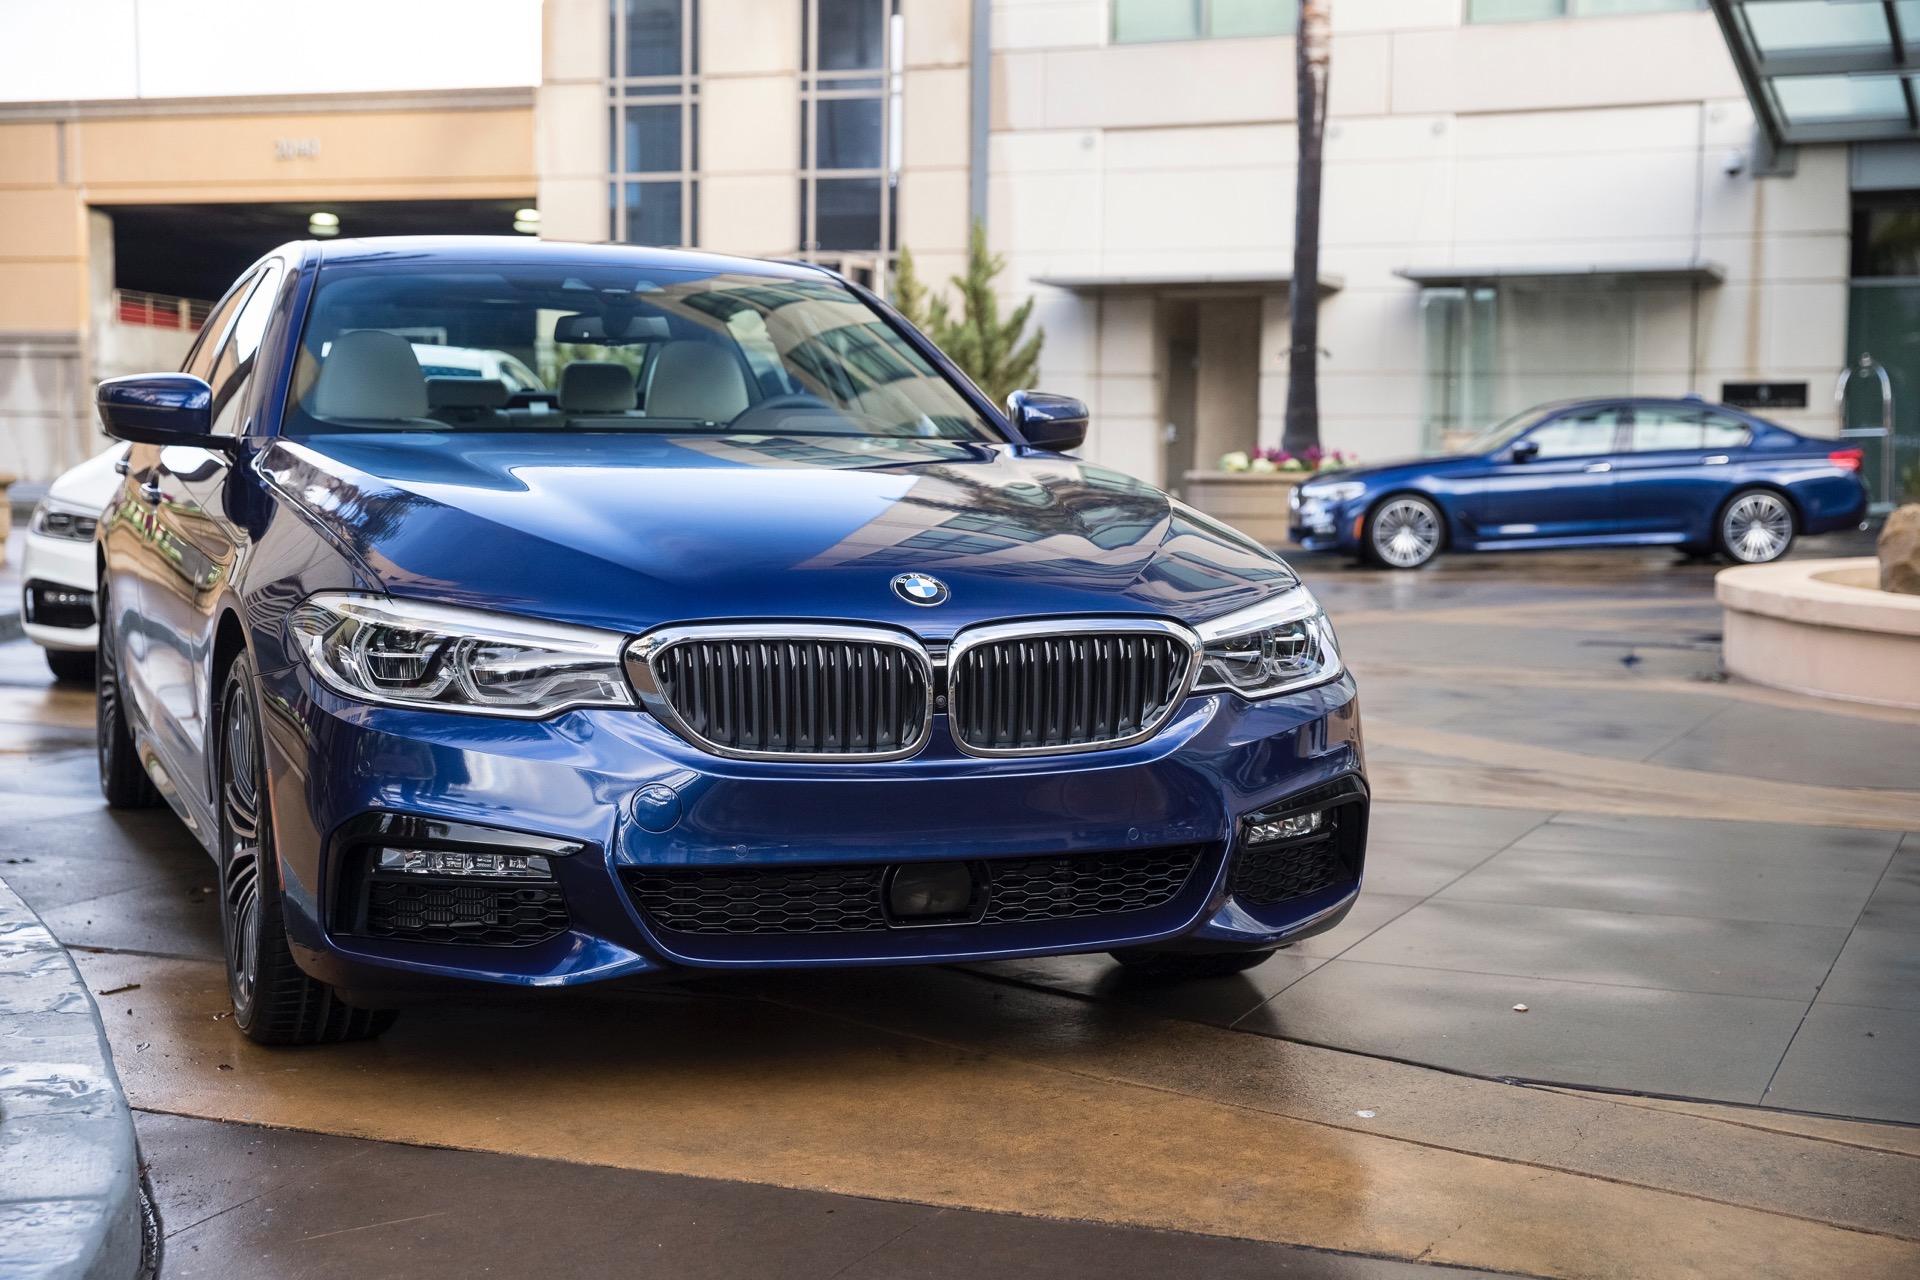 2017 BMW 5 Series G30206